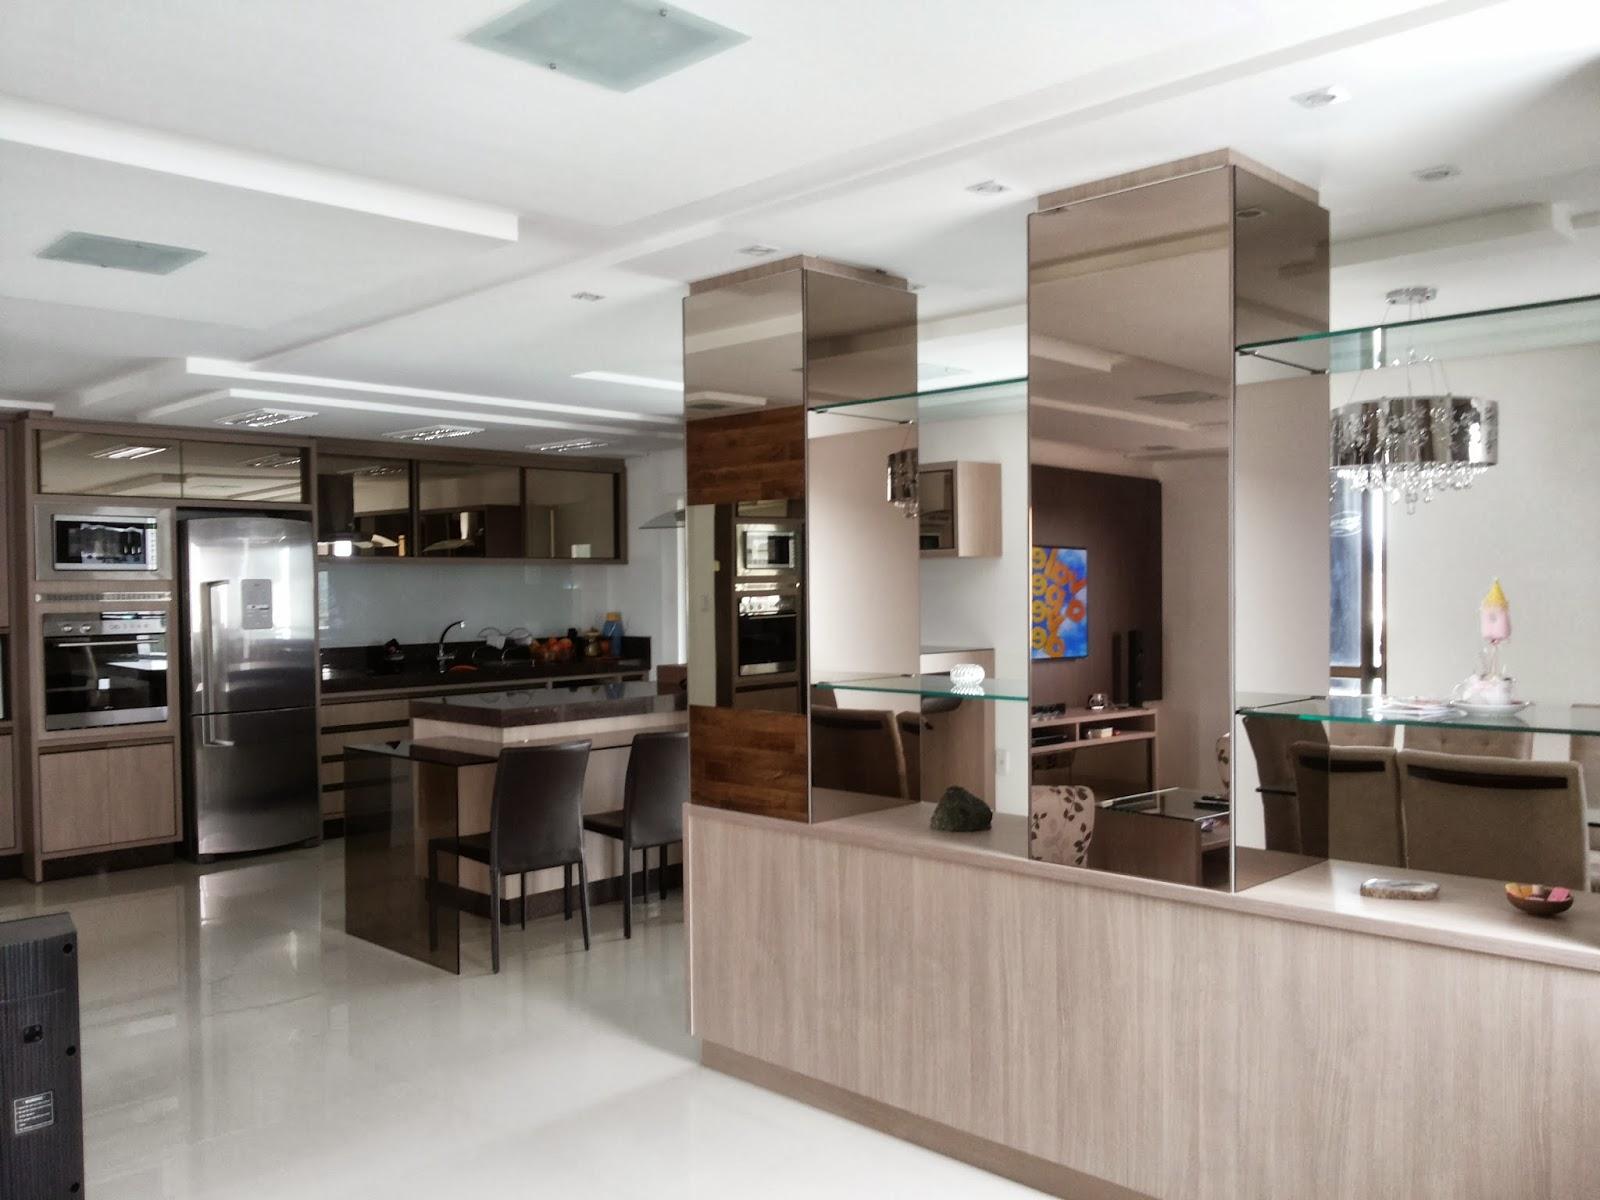 LA Arquitetura: Projeto de interior apartamento! #312820 1600 1200